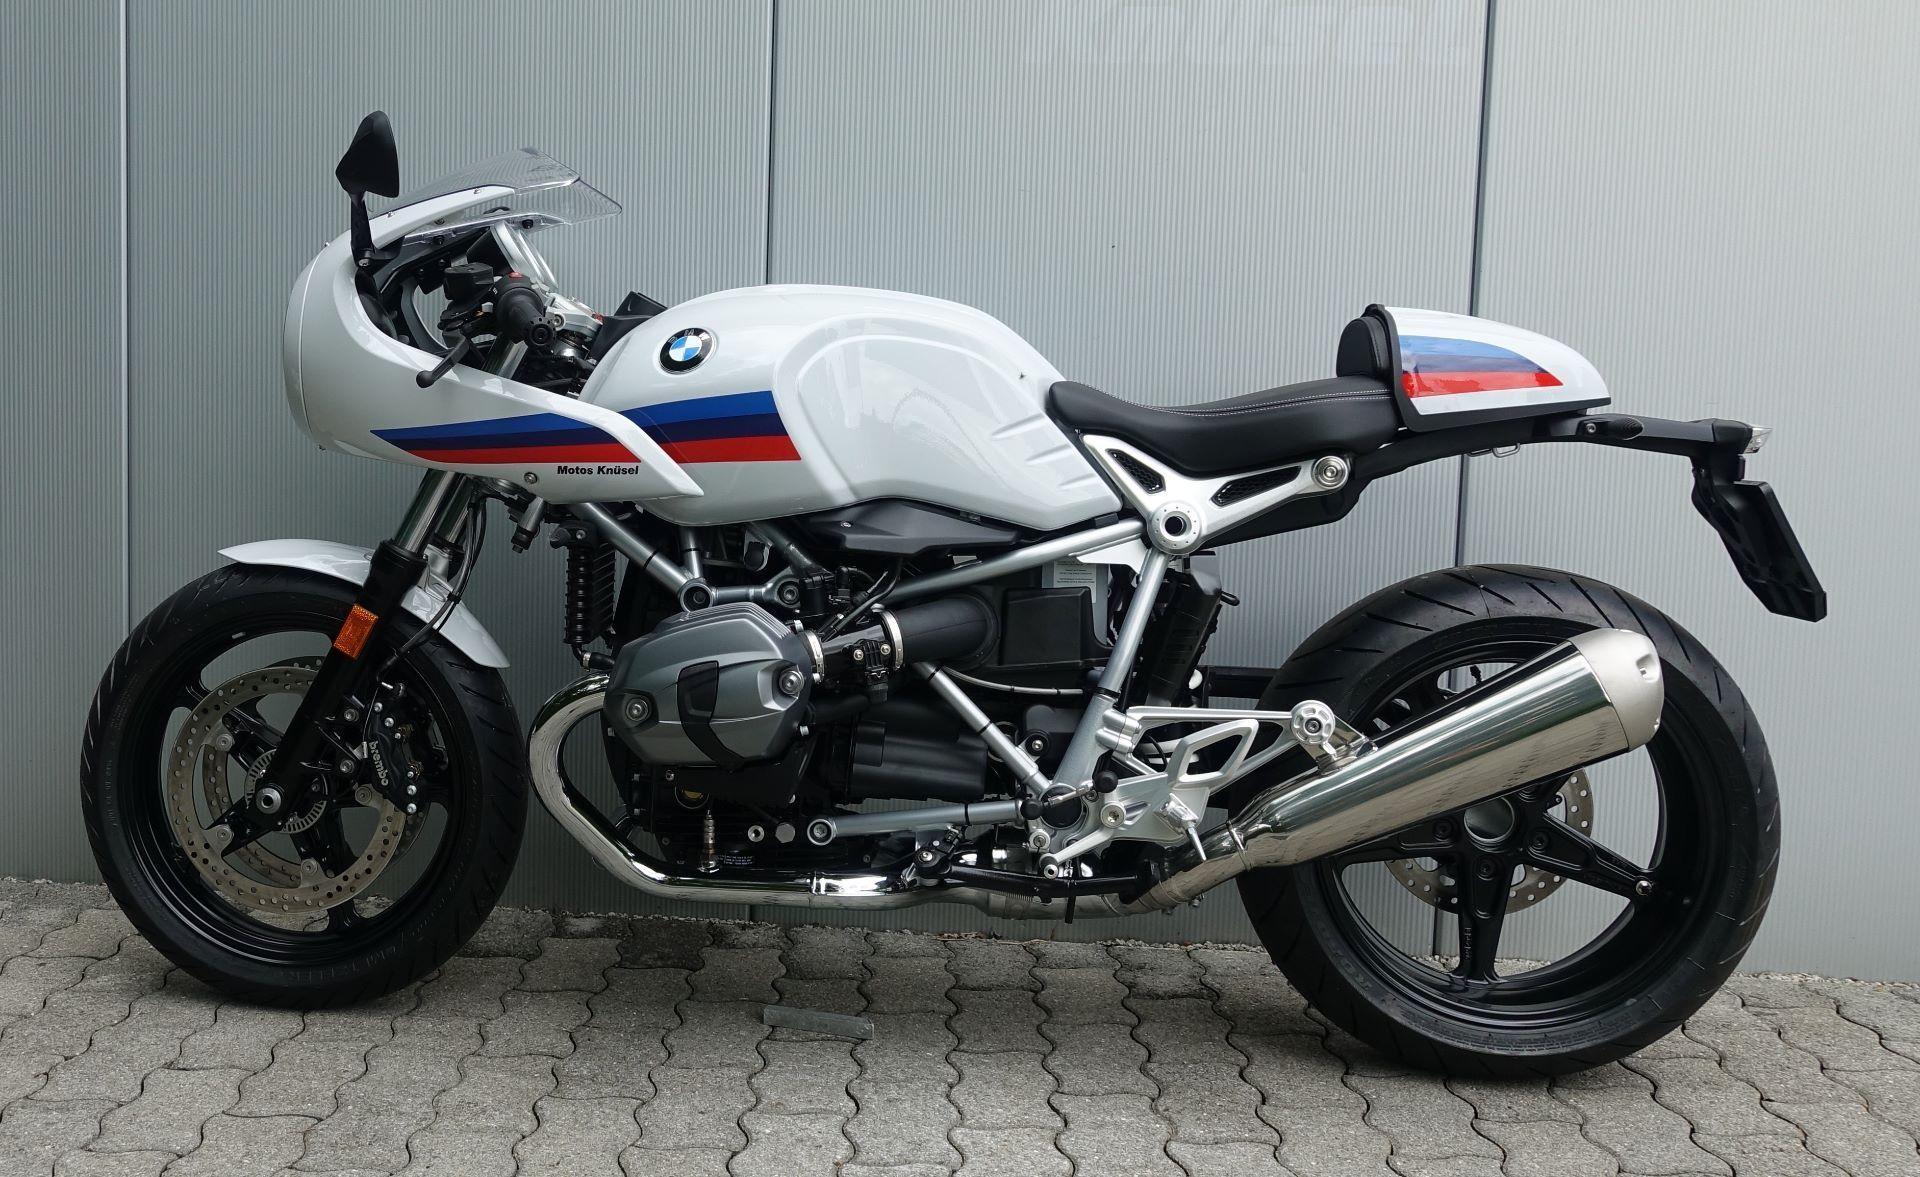 moto occasions acheter bmw r nine t racer abs motos kn sel gmbh ebnet entlebuch. Black Bedroom Furniture Sets. Home Design Ideas